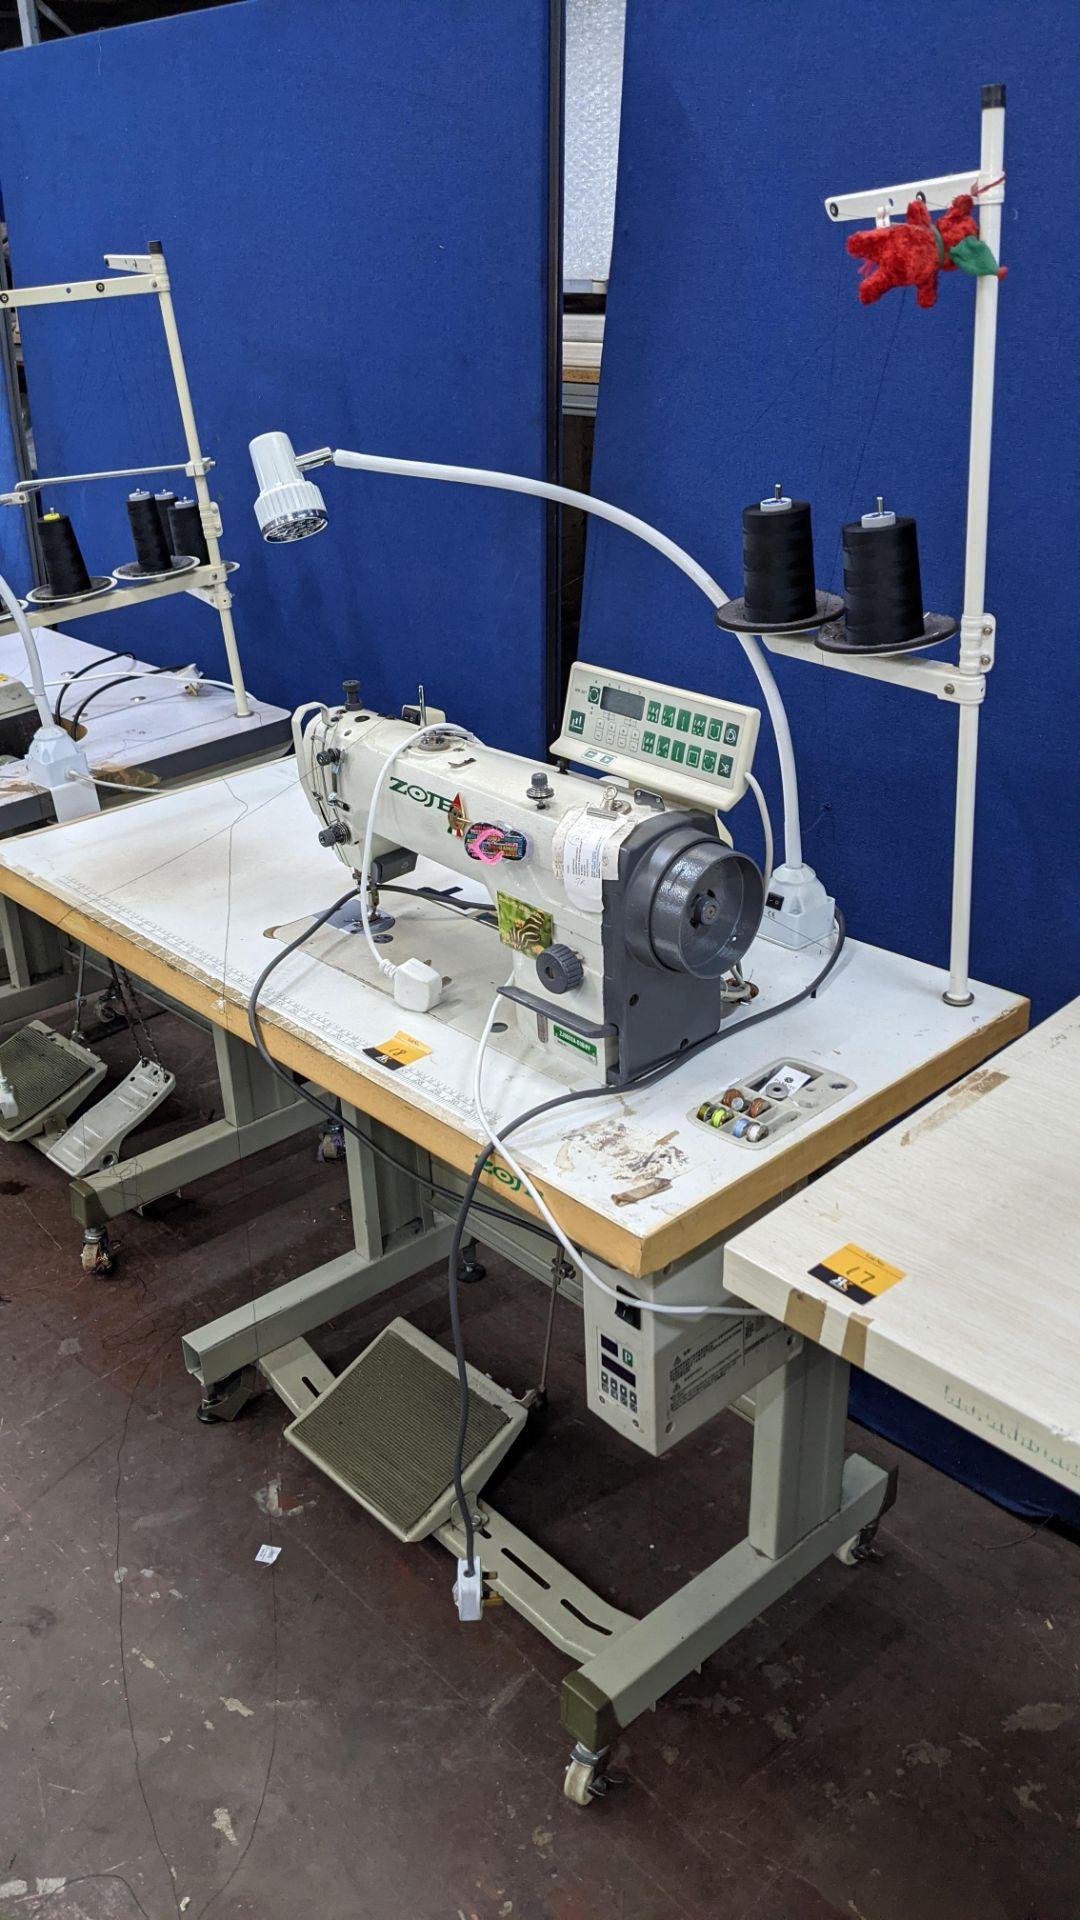 Zoje model ZJ9800A-D3B/PF lockstitch sewing machine with model WR-501 digital controller